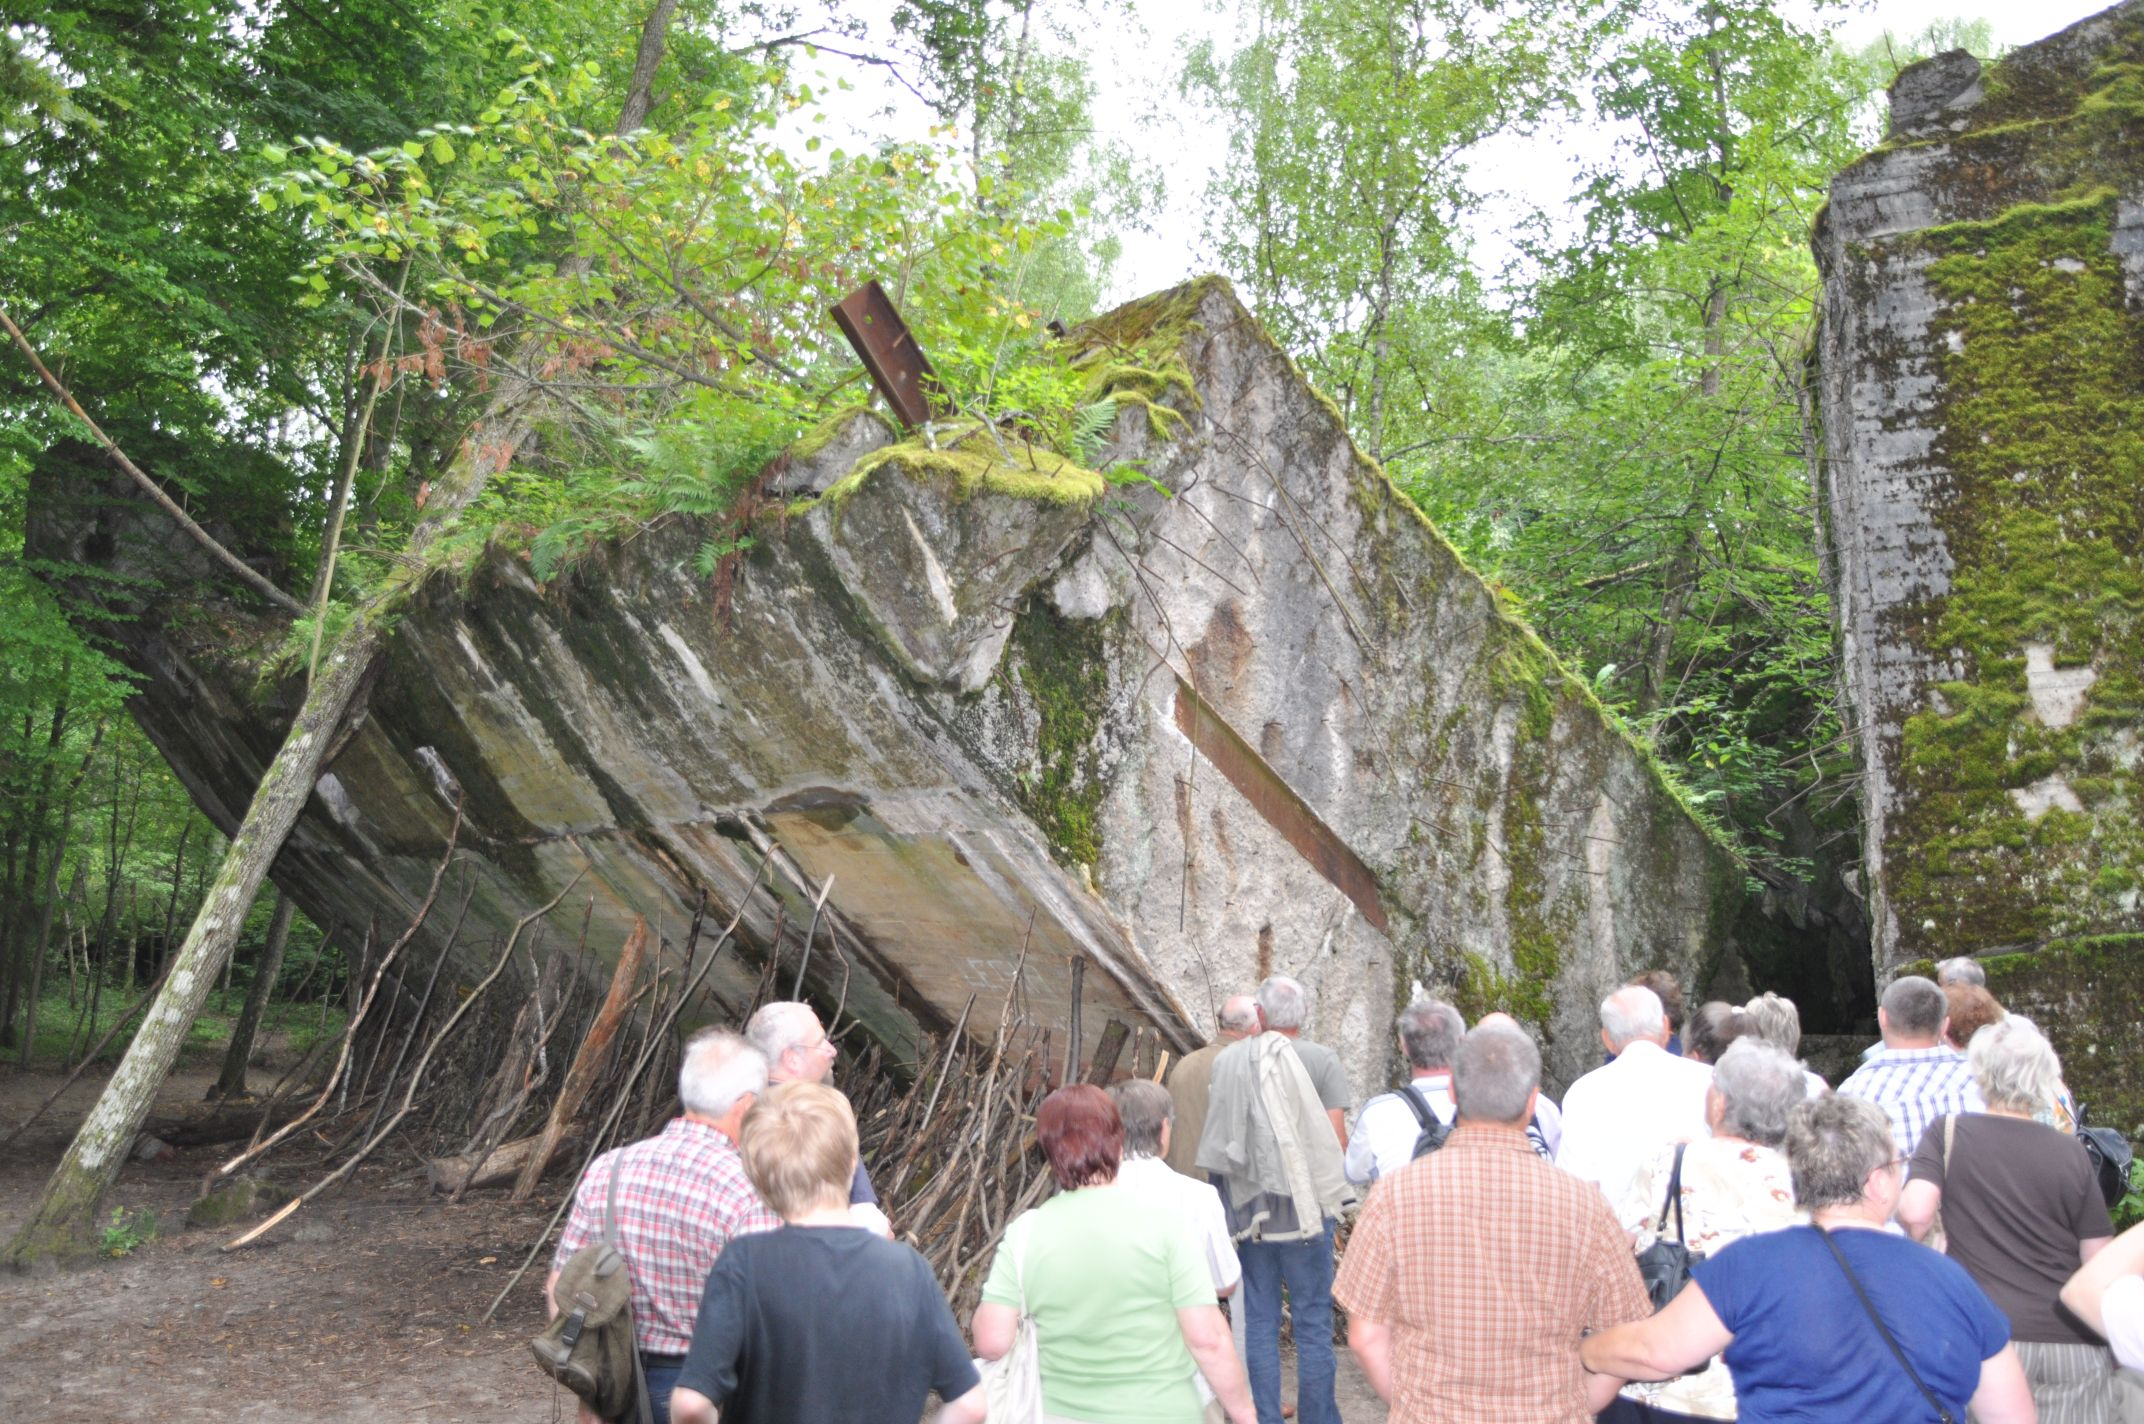 meterdicke Bunkerwände